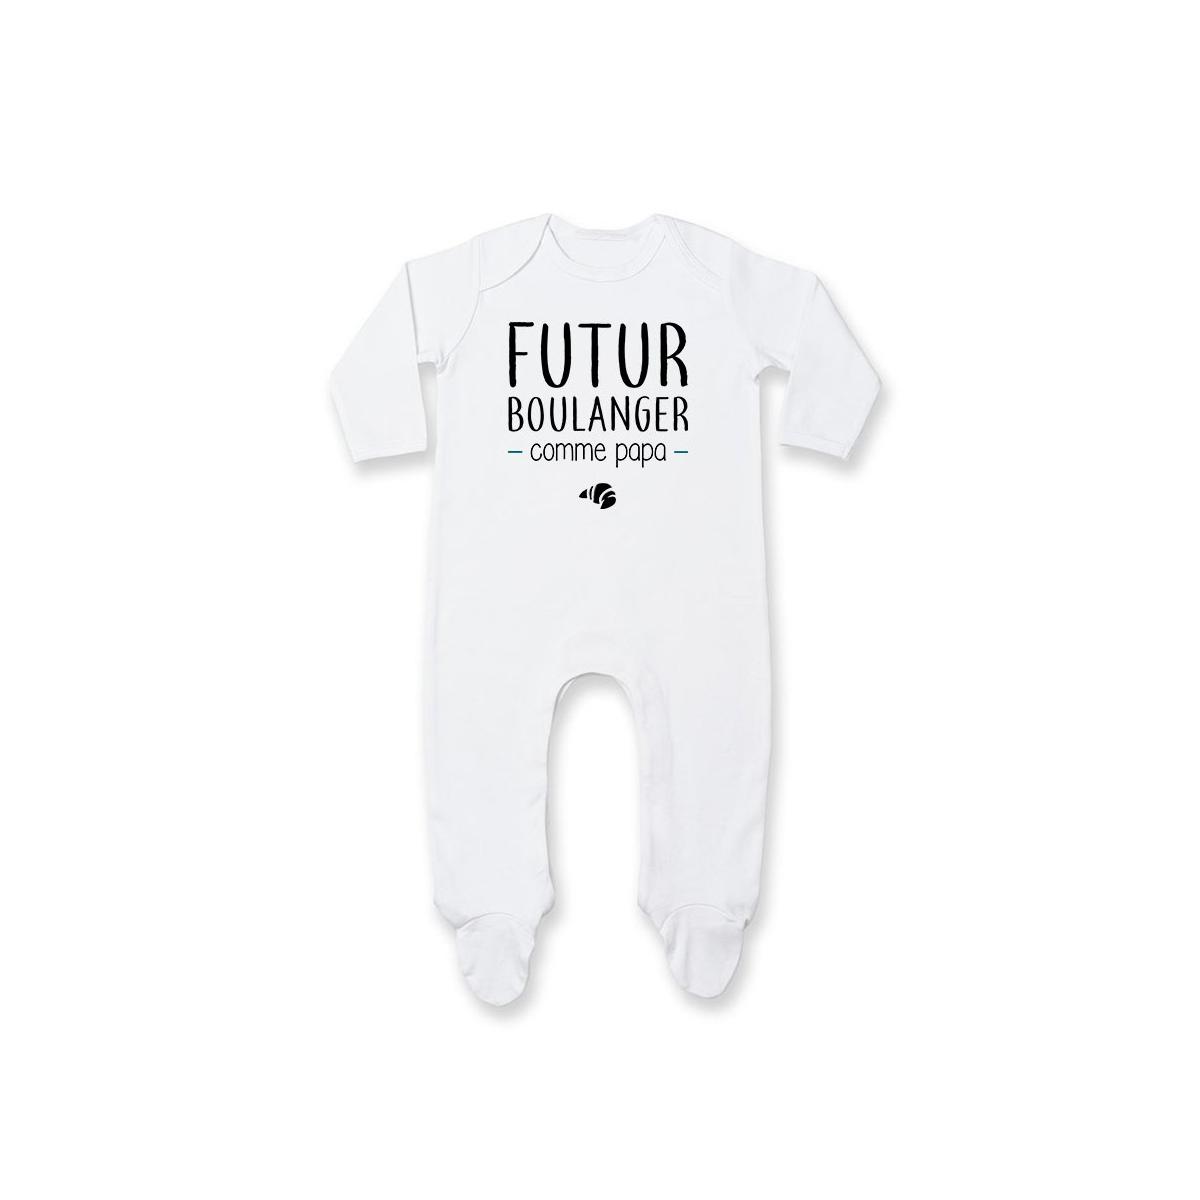 Pyjama bébé Futur boulanger comme papa